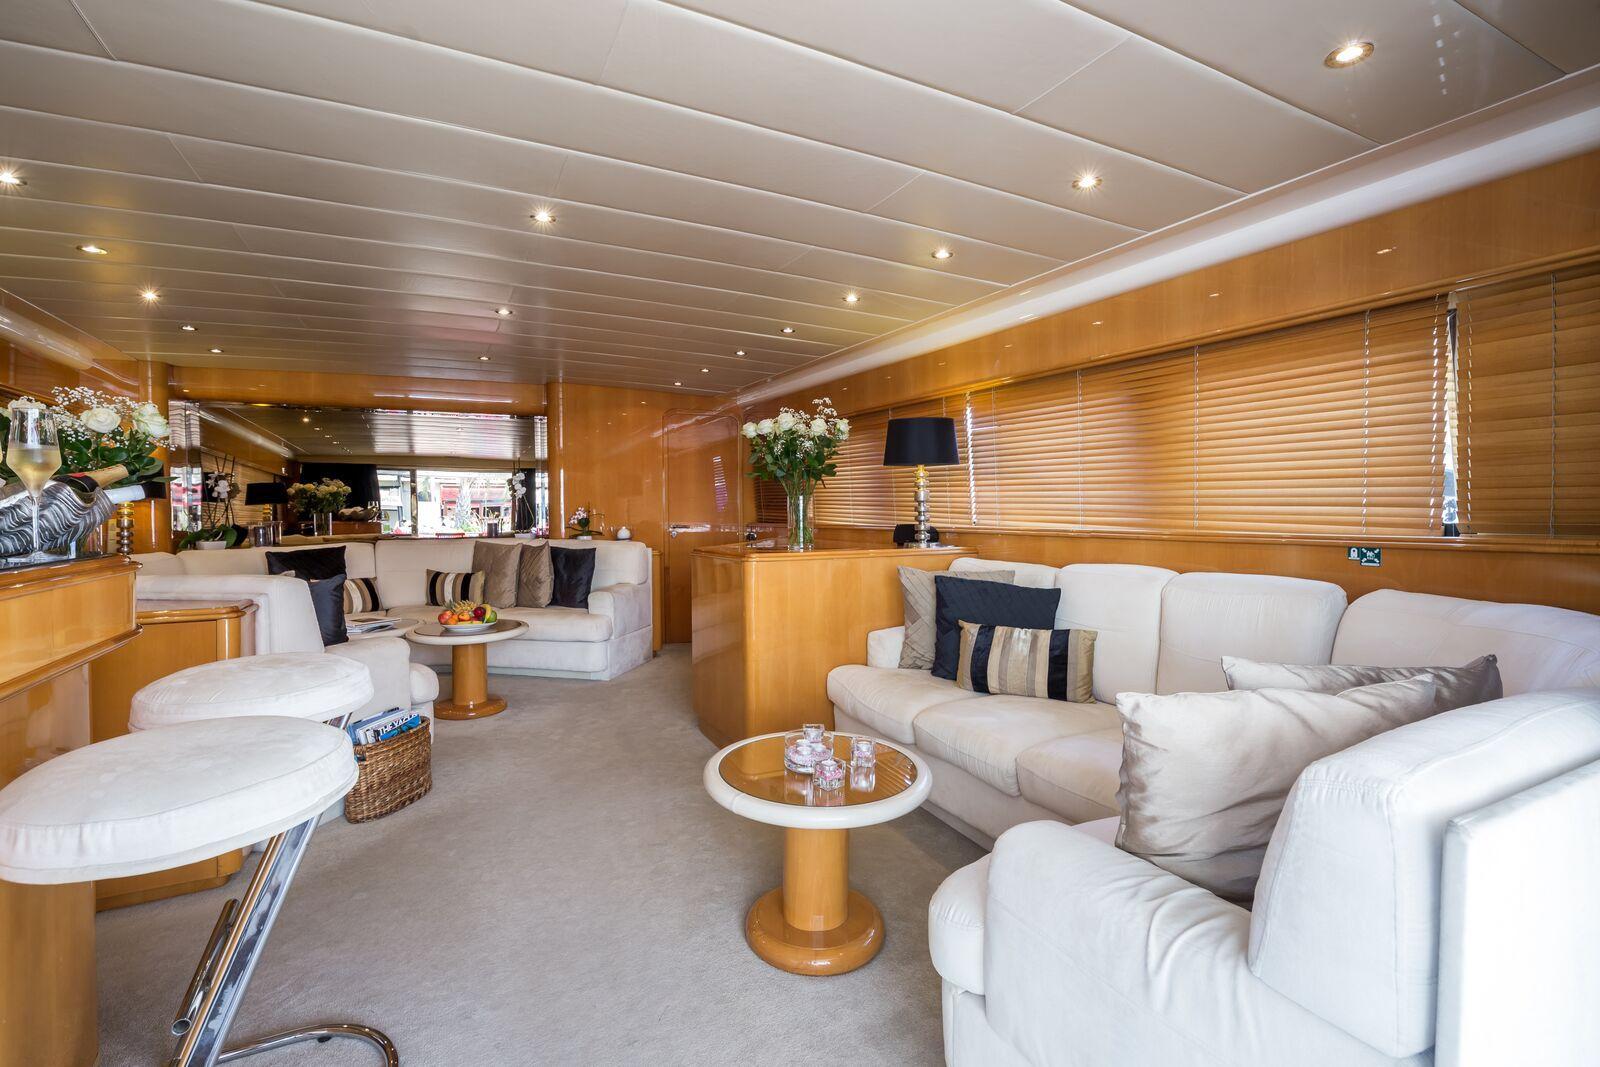 INDULGENCE OF POOLE Mangusta 86 Luxury Superyacht Saloon